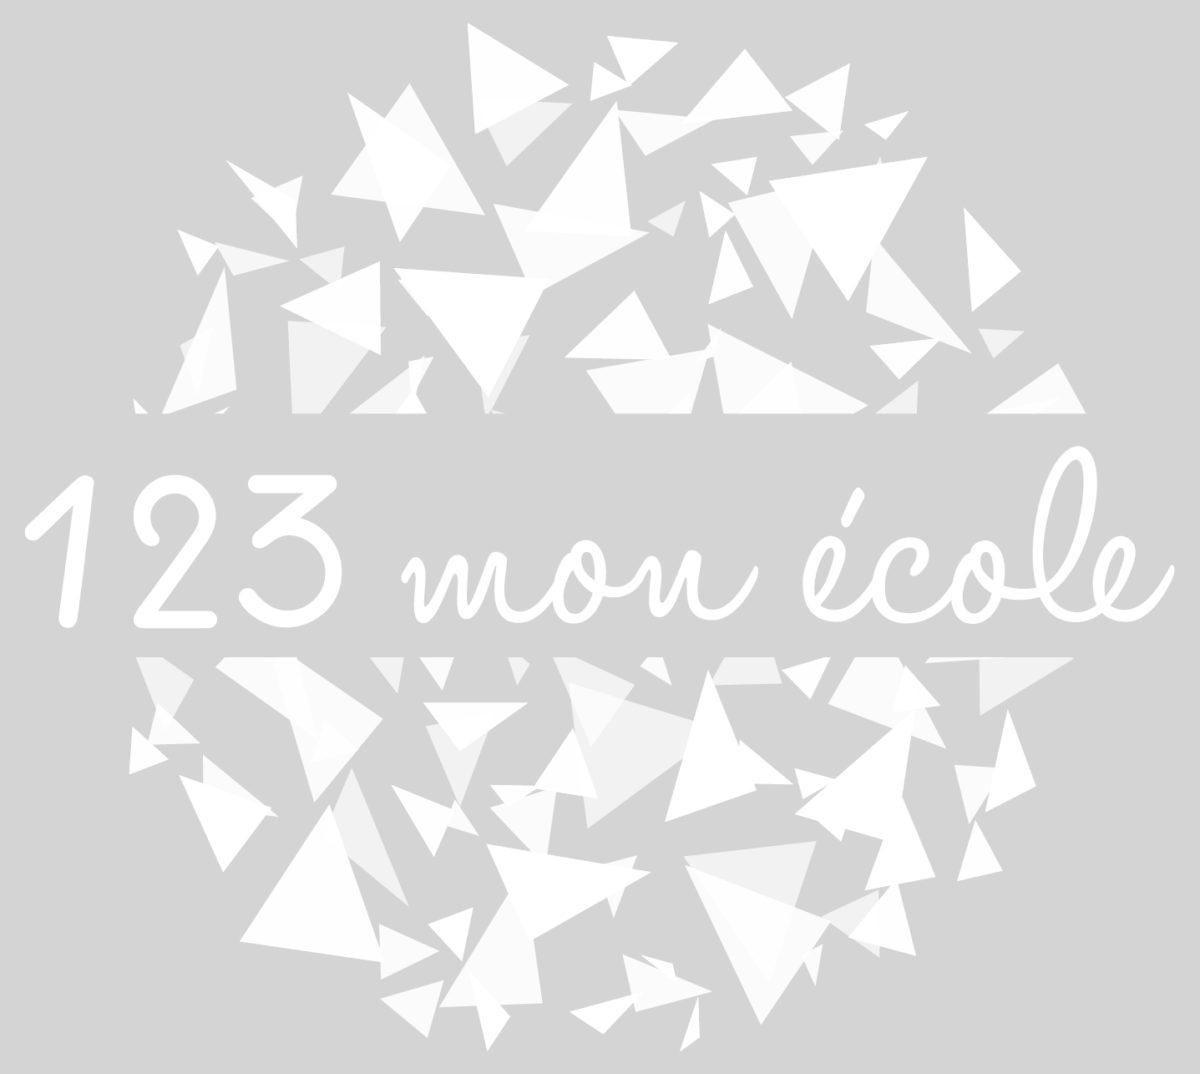 Logo-123monécole